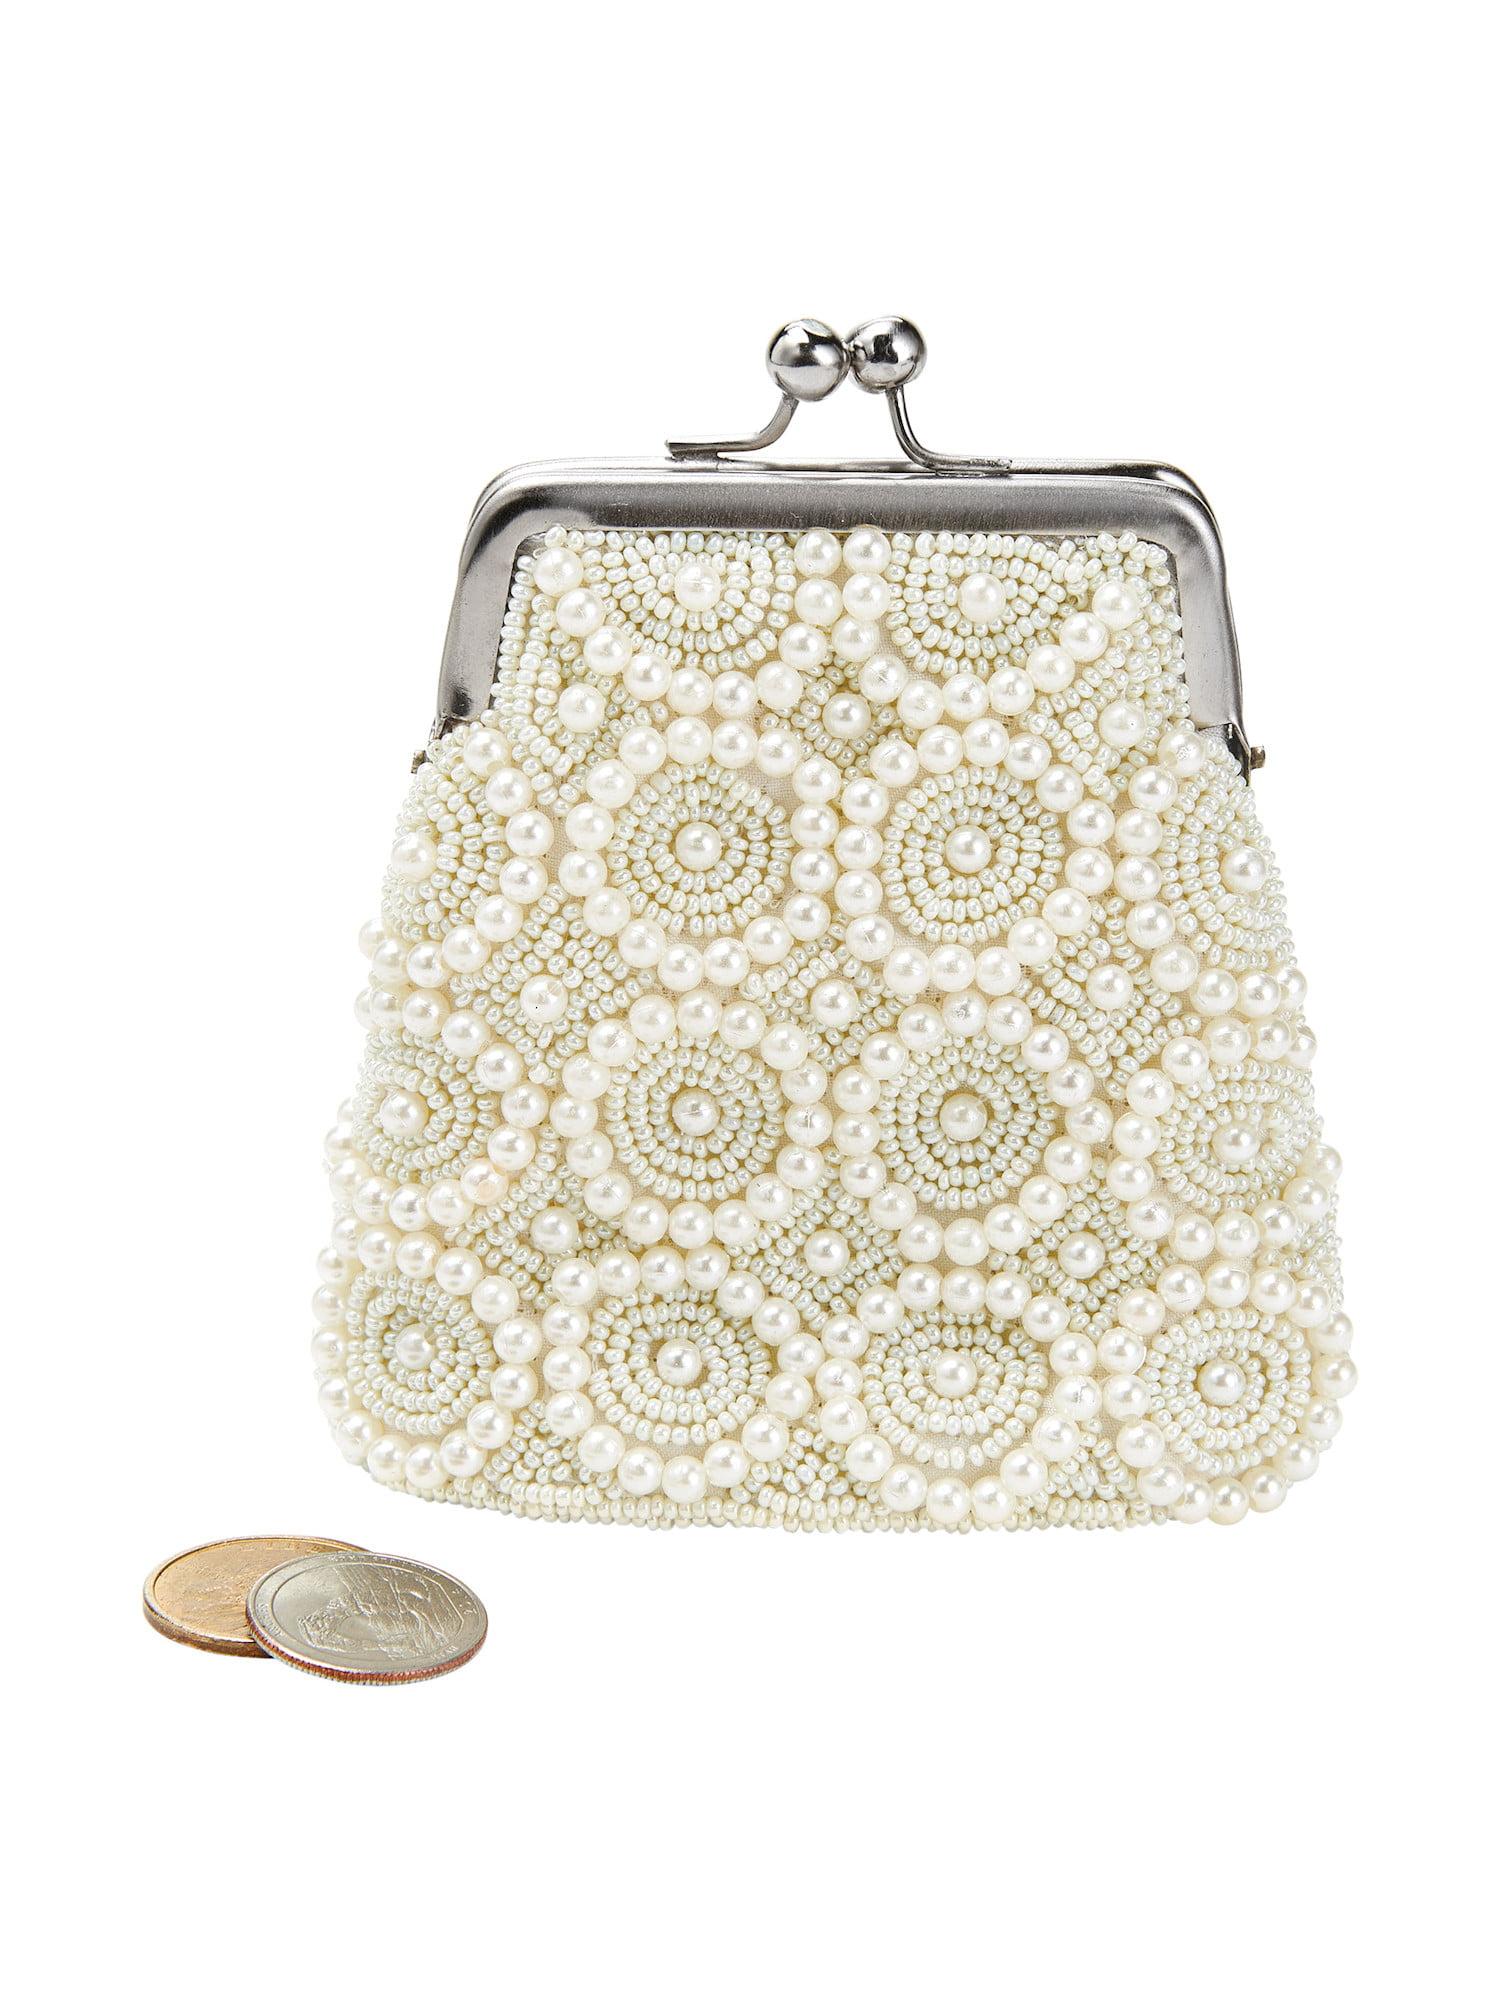 UTO Women Small Crossbody Bag Adorn Roomy Zipper Pocket Cell Phone Wallet Card Holder Shoulder Purse